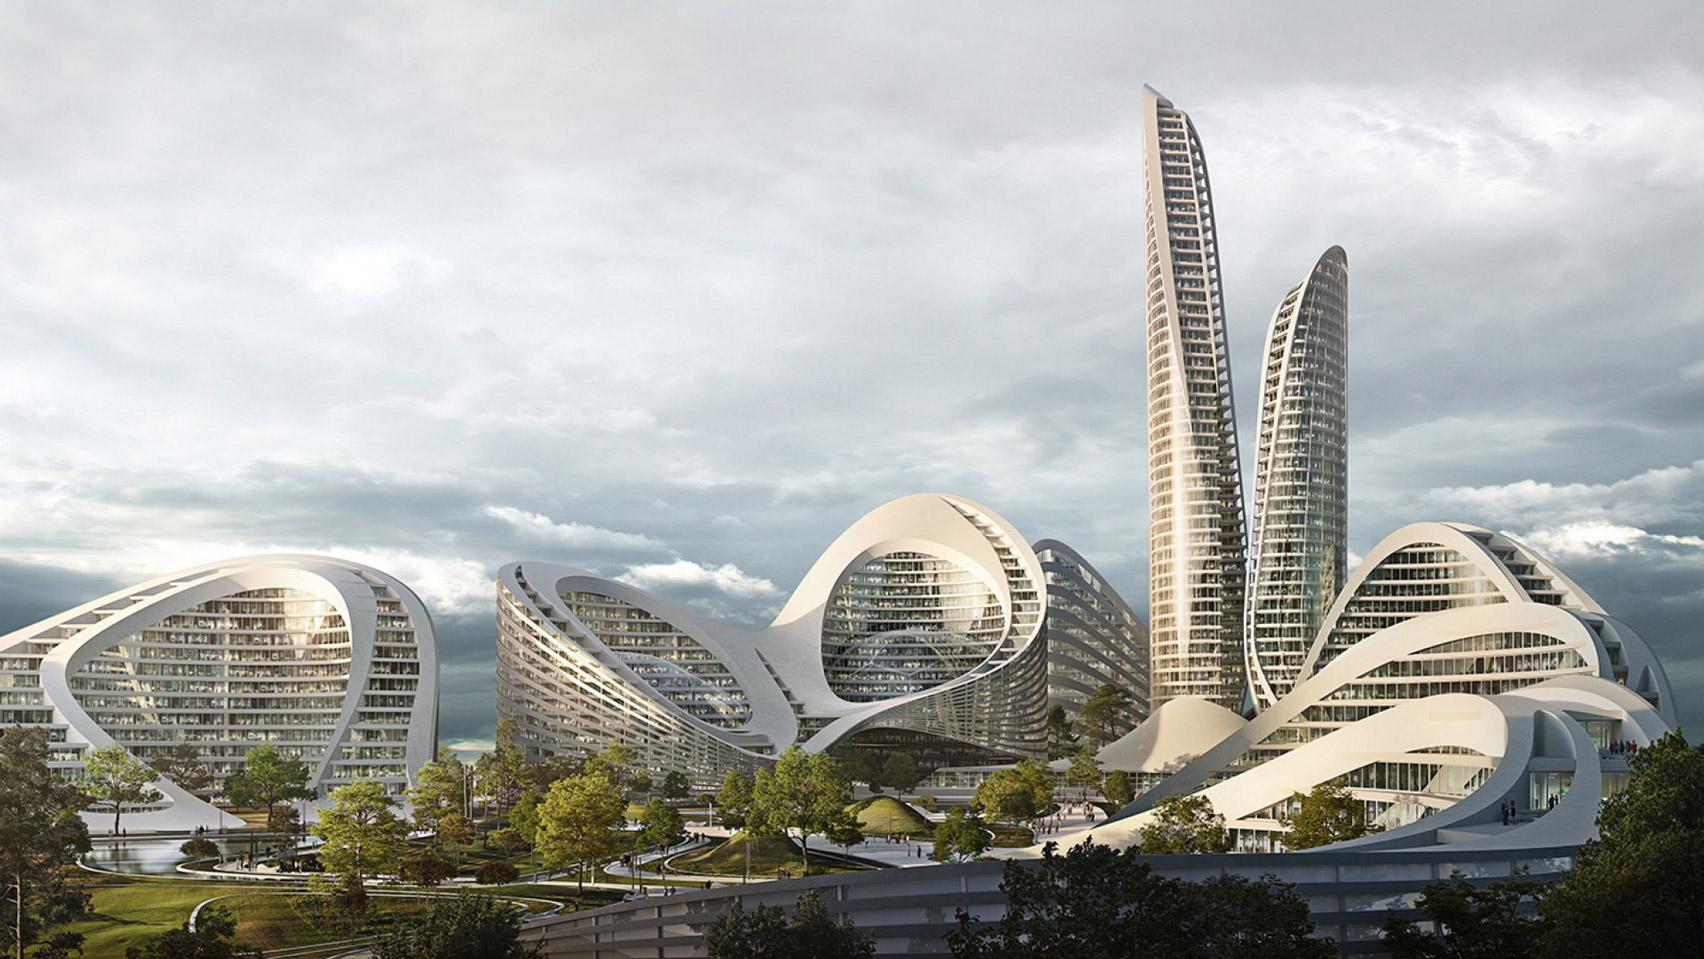 dezeen.com - India Block - Zaha Hadid Architects to design new smart city outside Moscow